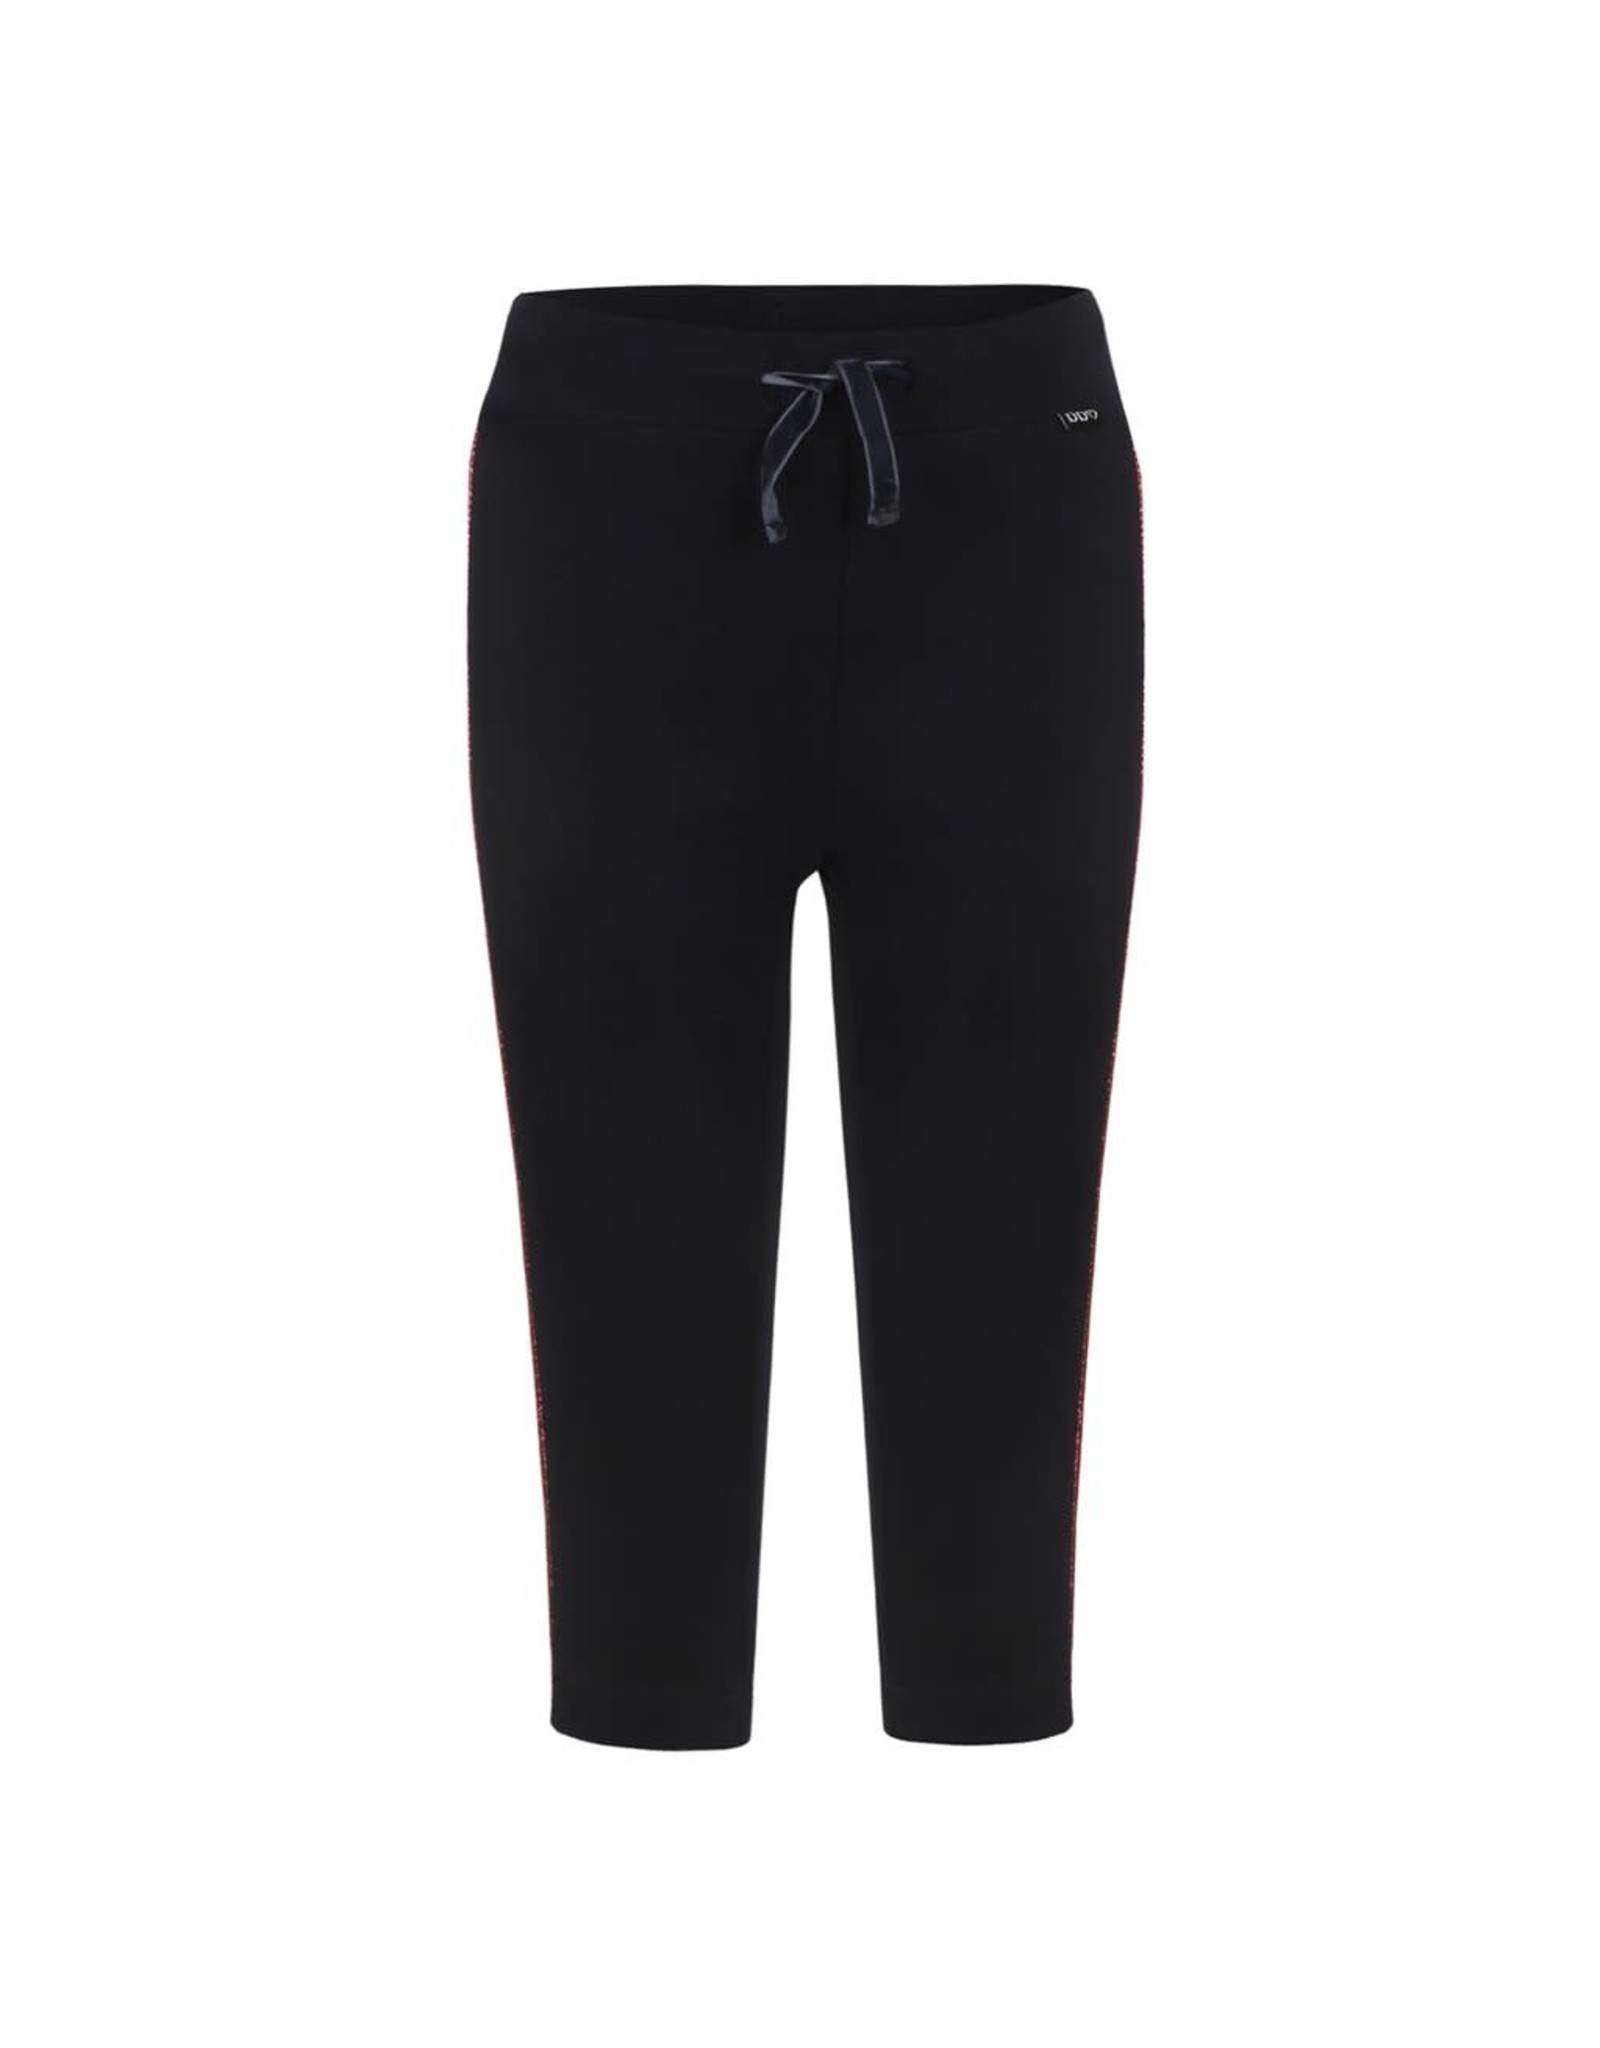 Beebielove 2535 Sweatpants